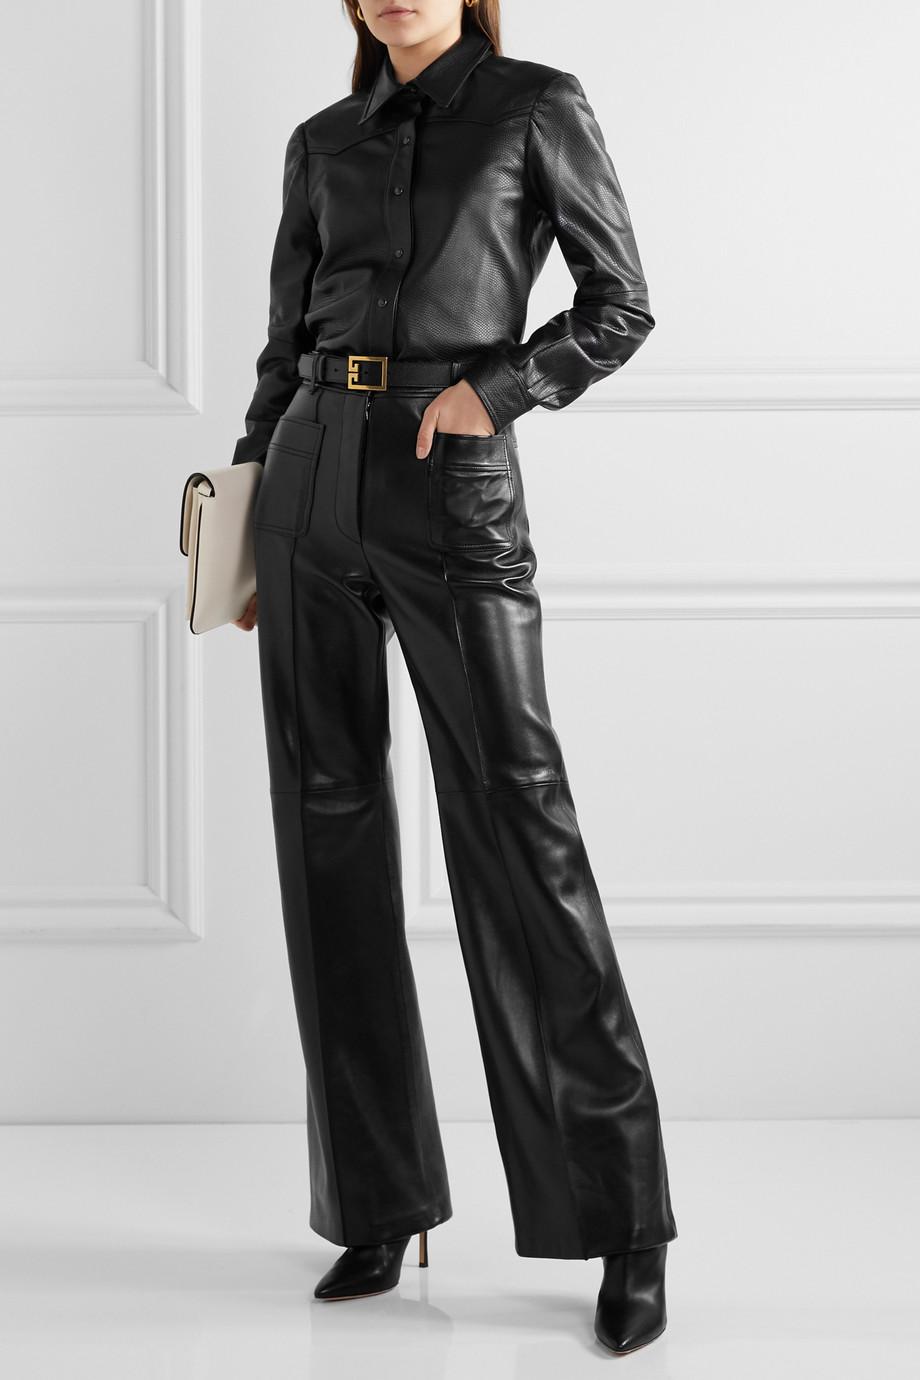 Gucci Paneled leather wide-leg pants